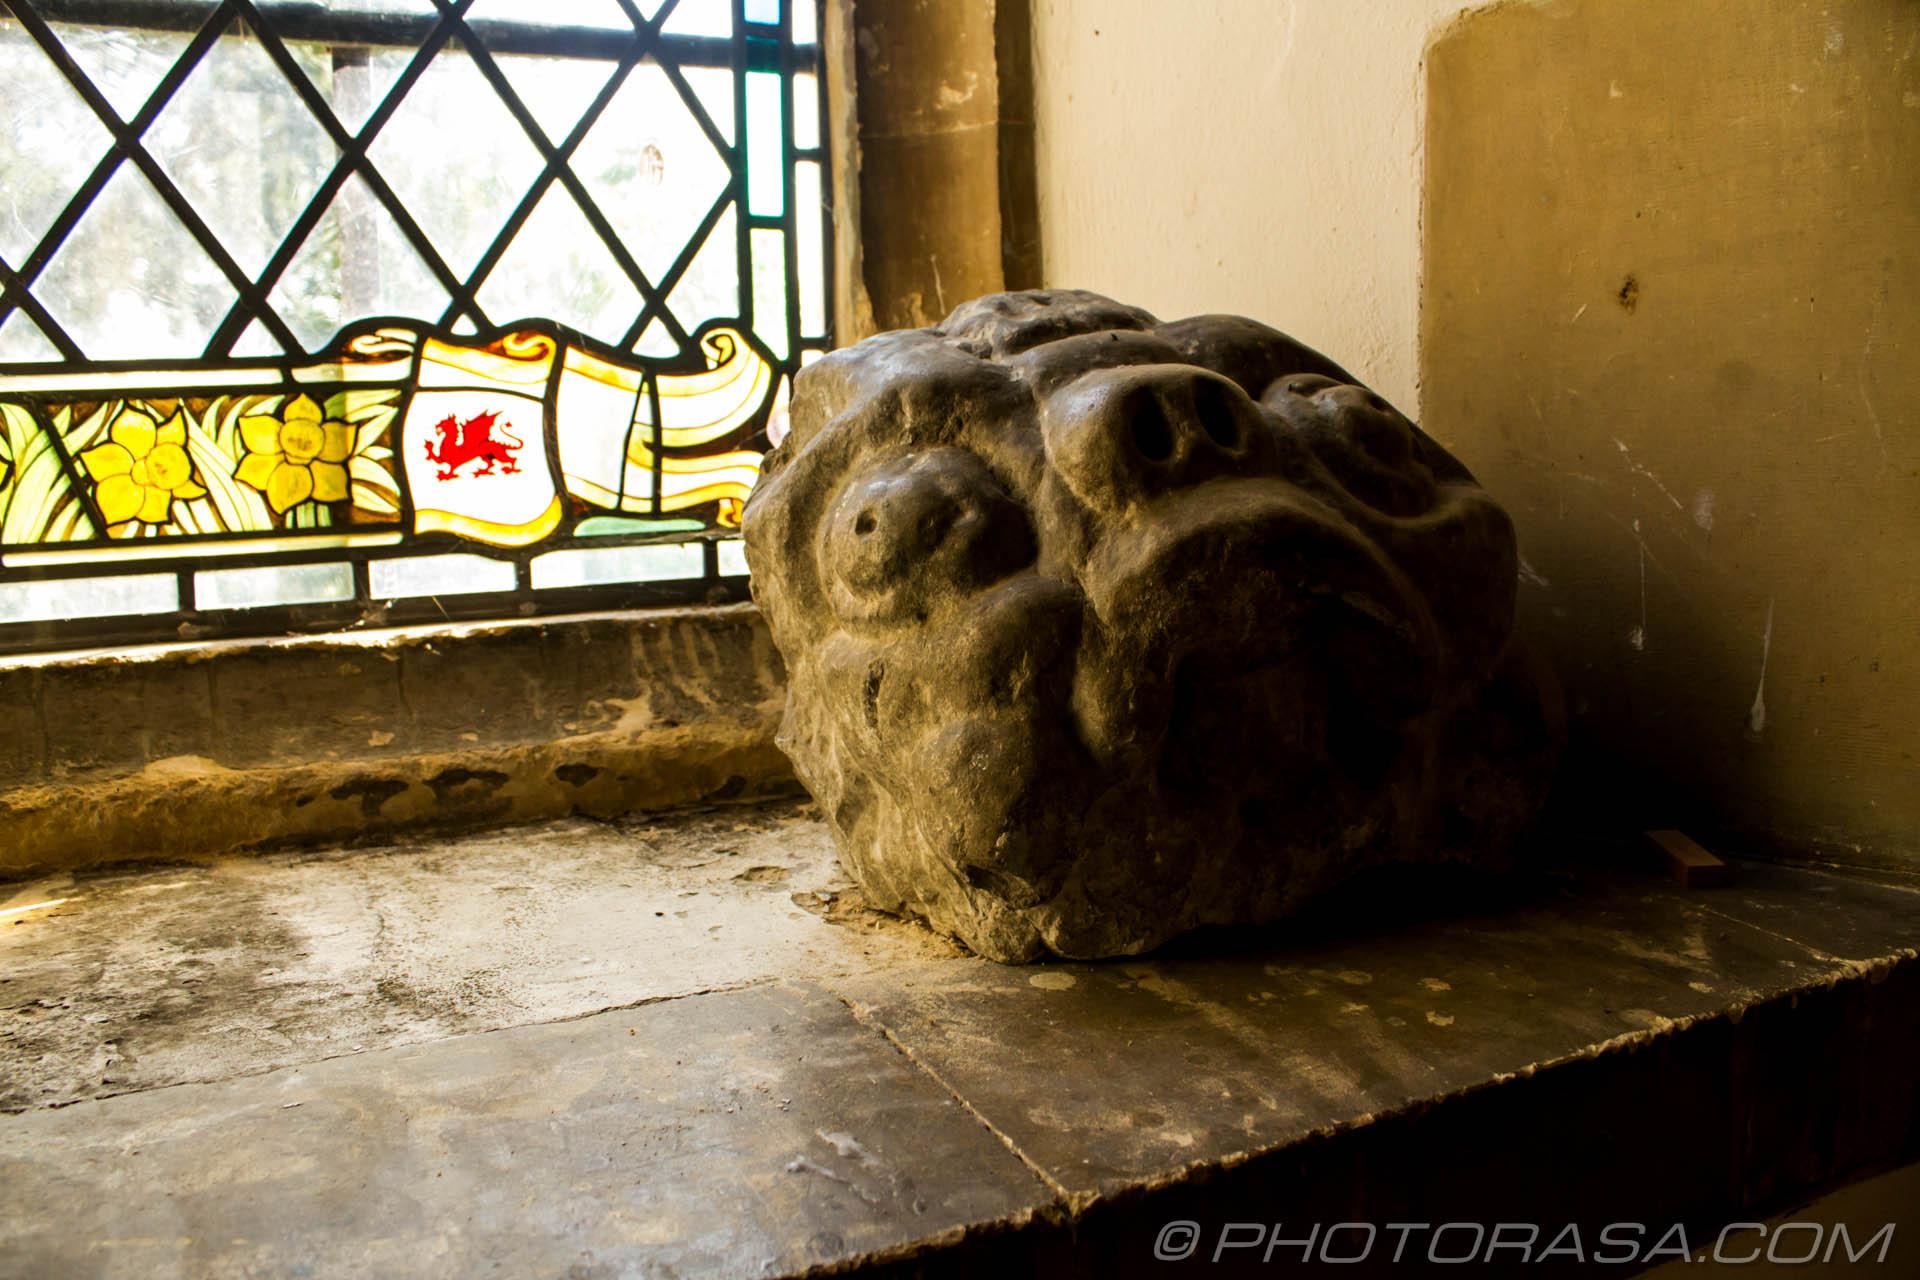 https://photorasa.com/saints-church-staplehurst-kent/stone-monster-face/